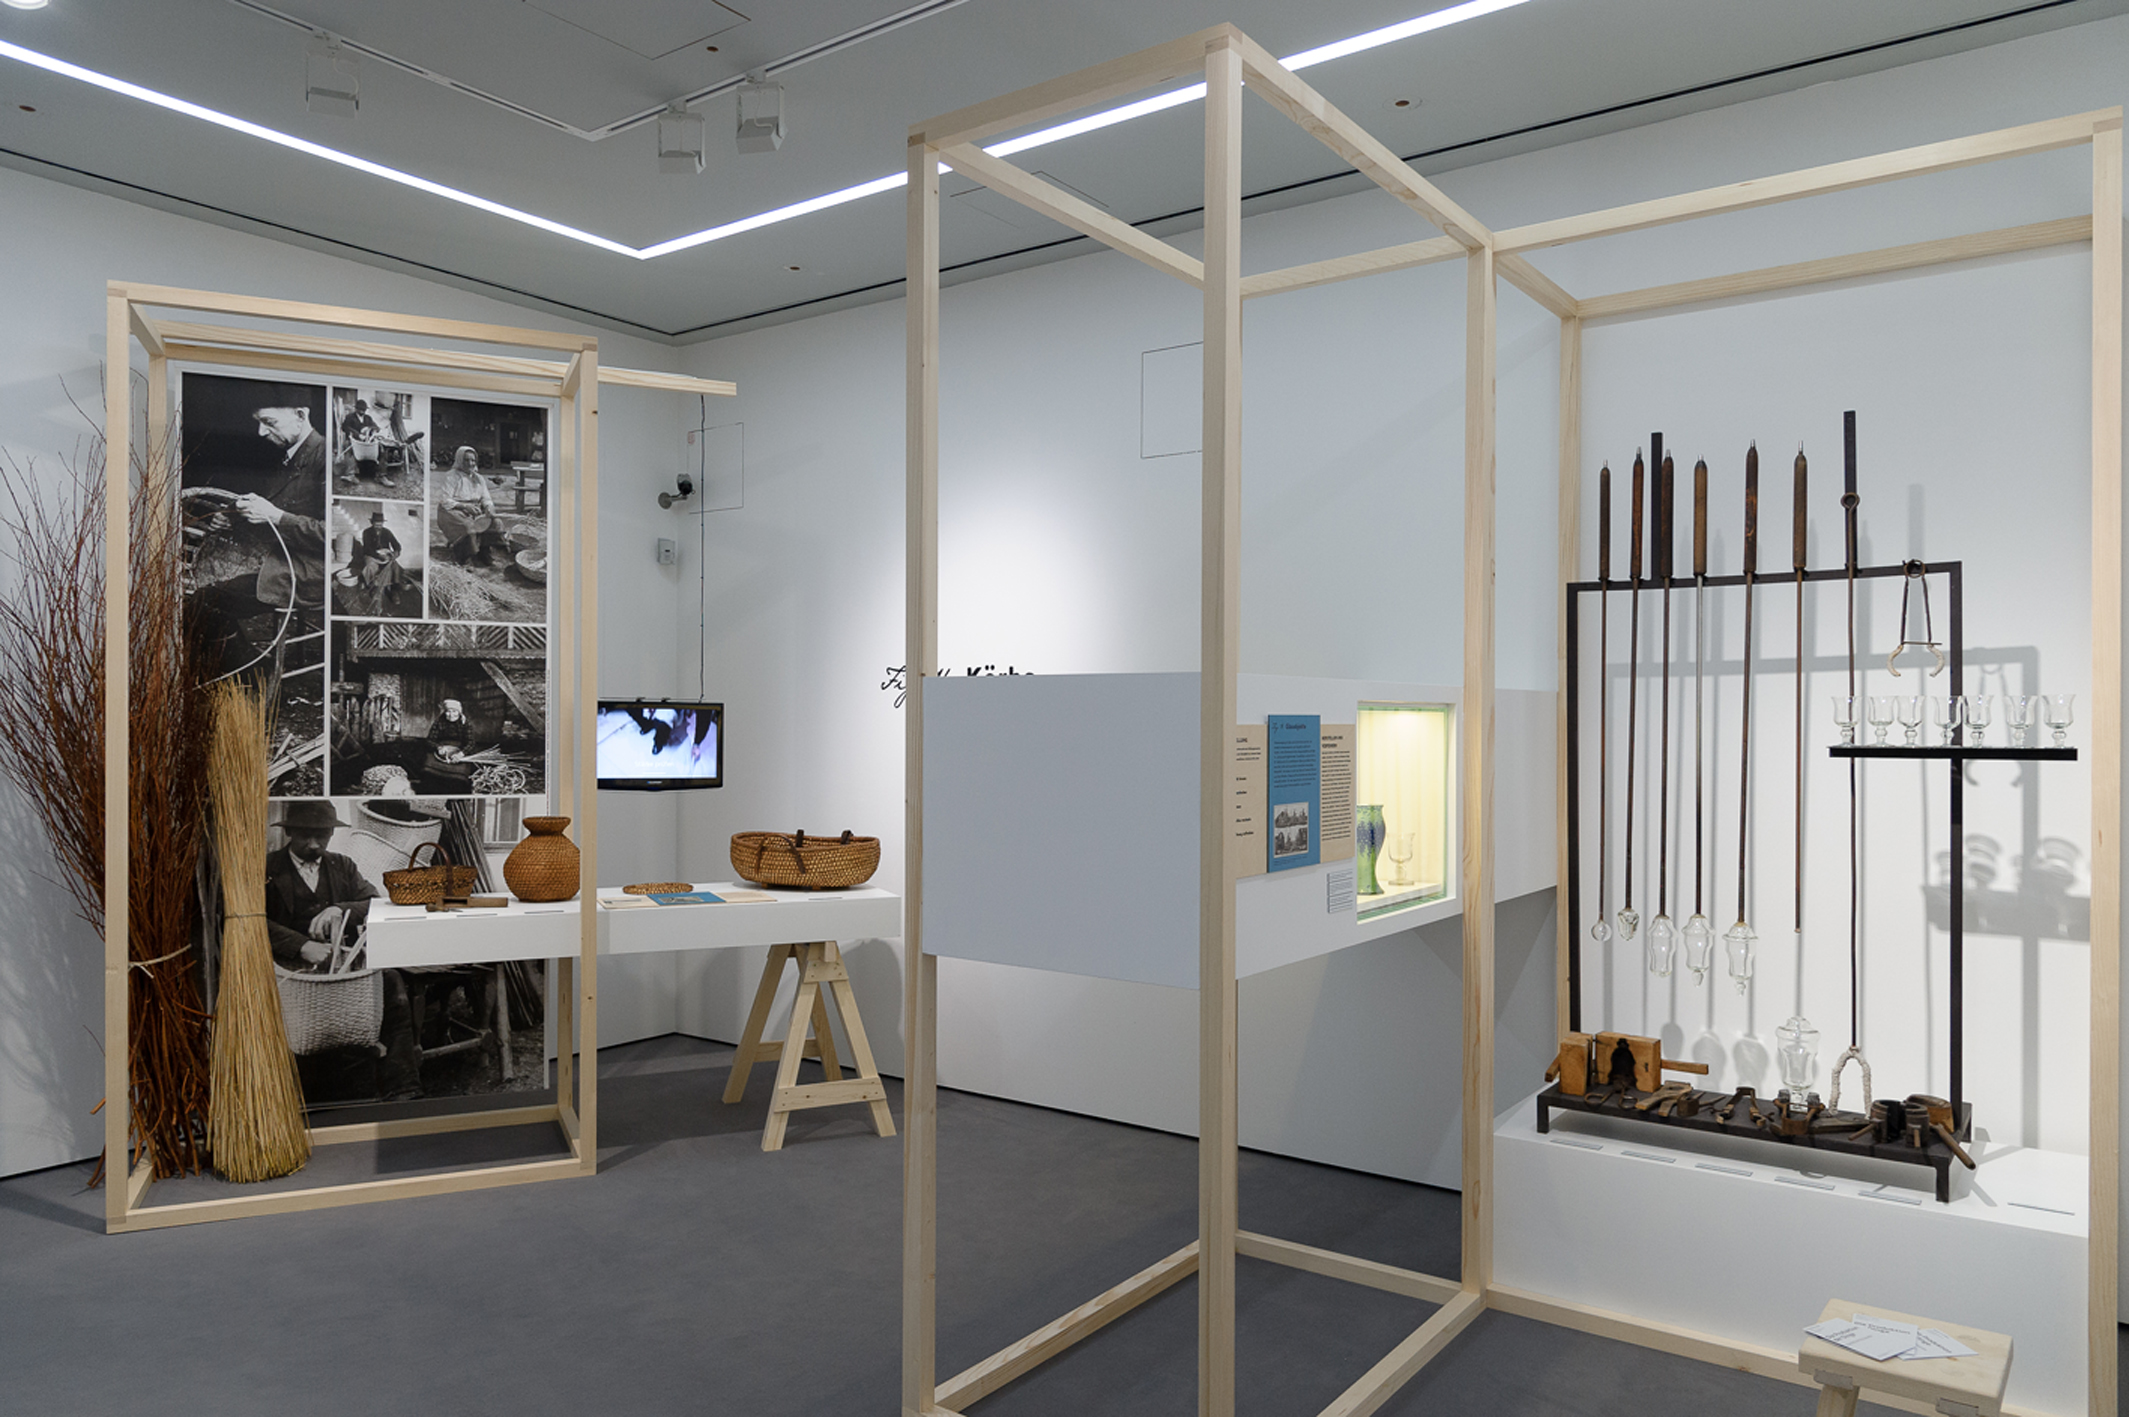 wie baut man eigentlich museumsblog. Black Bedroom Furniture Sets. Home Design Ideas